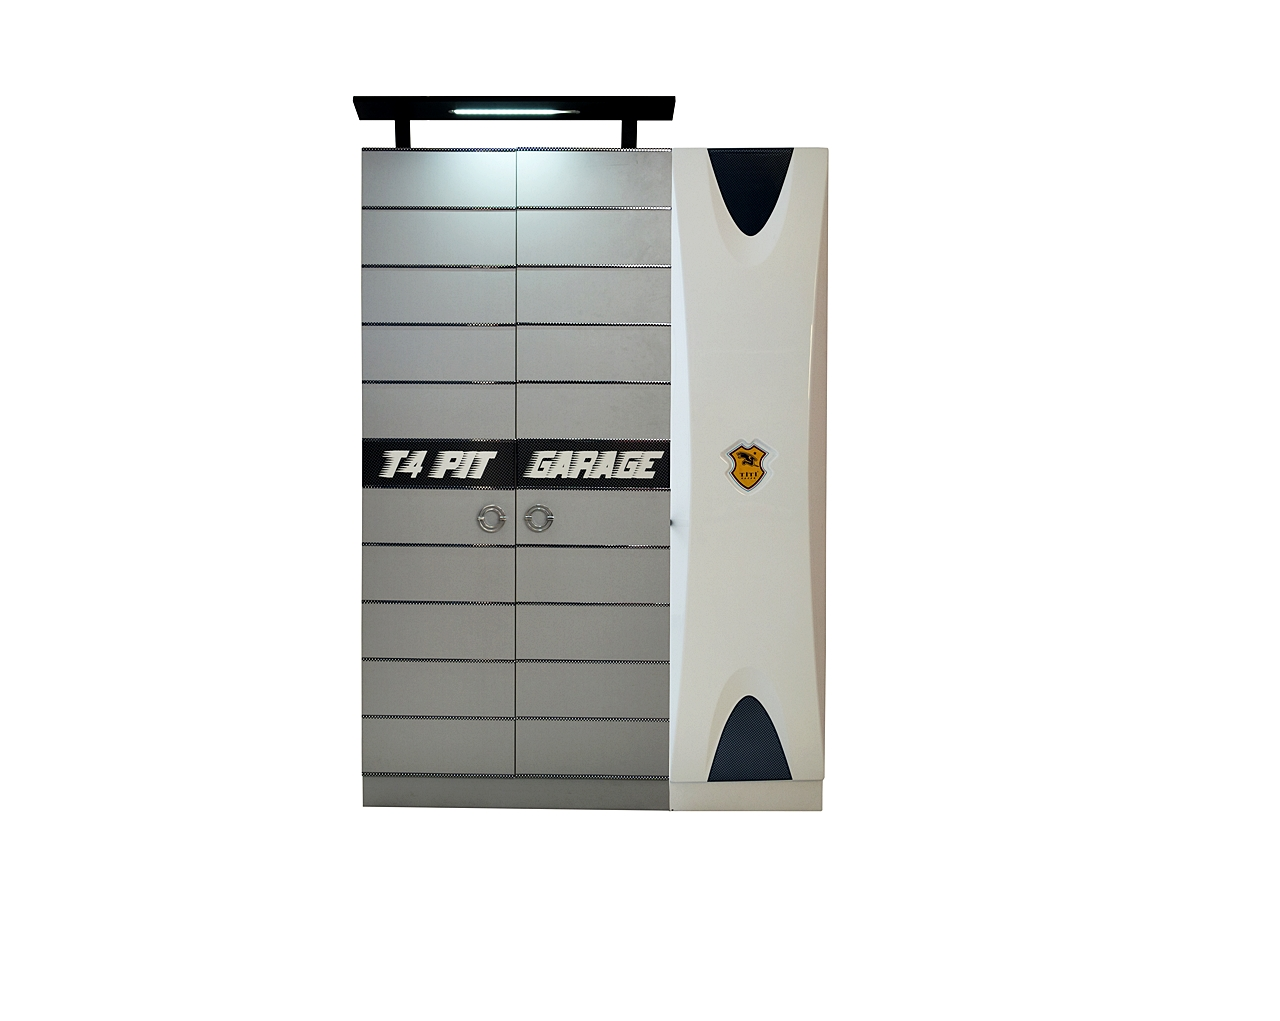 Titi Kinderkleiderschrank Grau/Weiß Cat Garage 3-türig